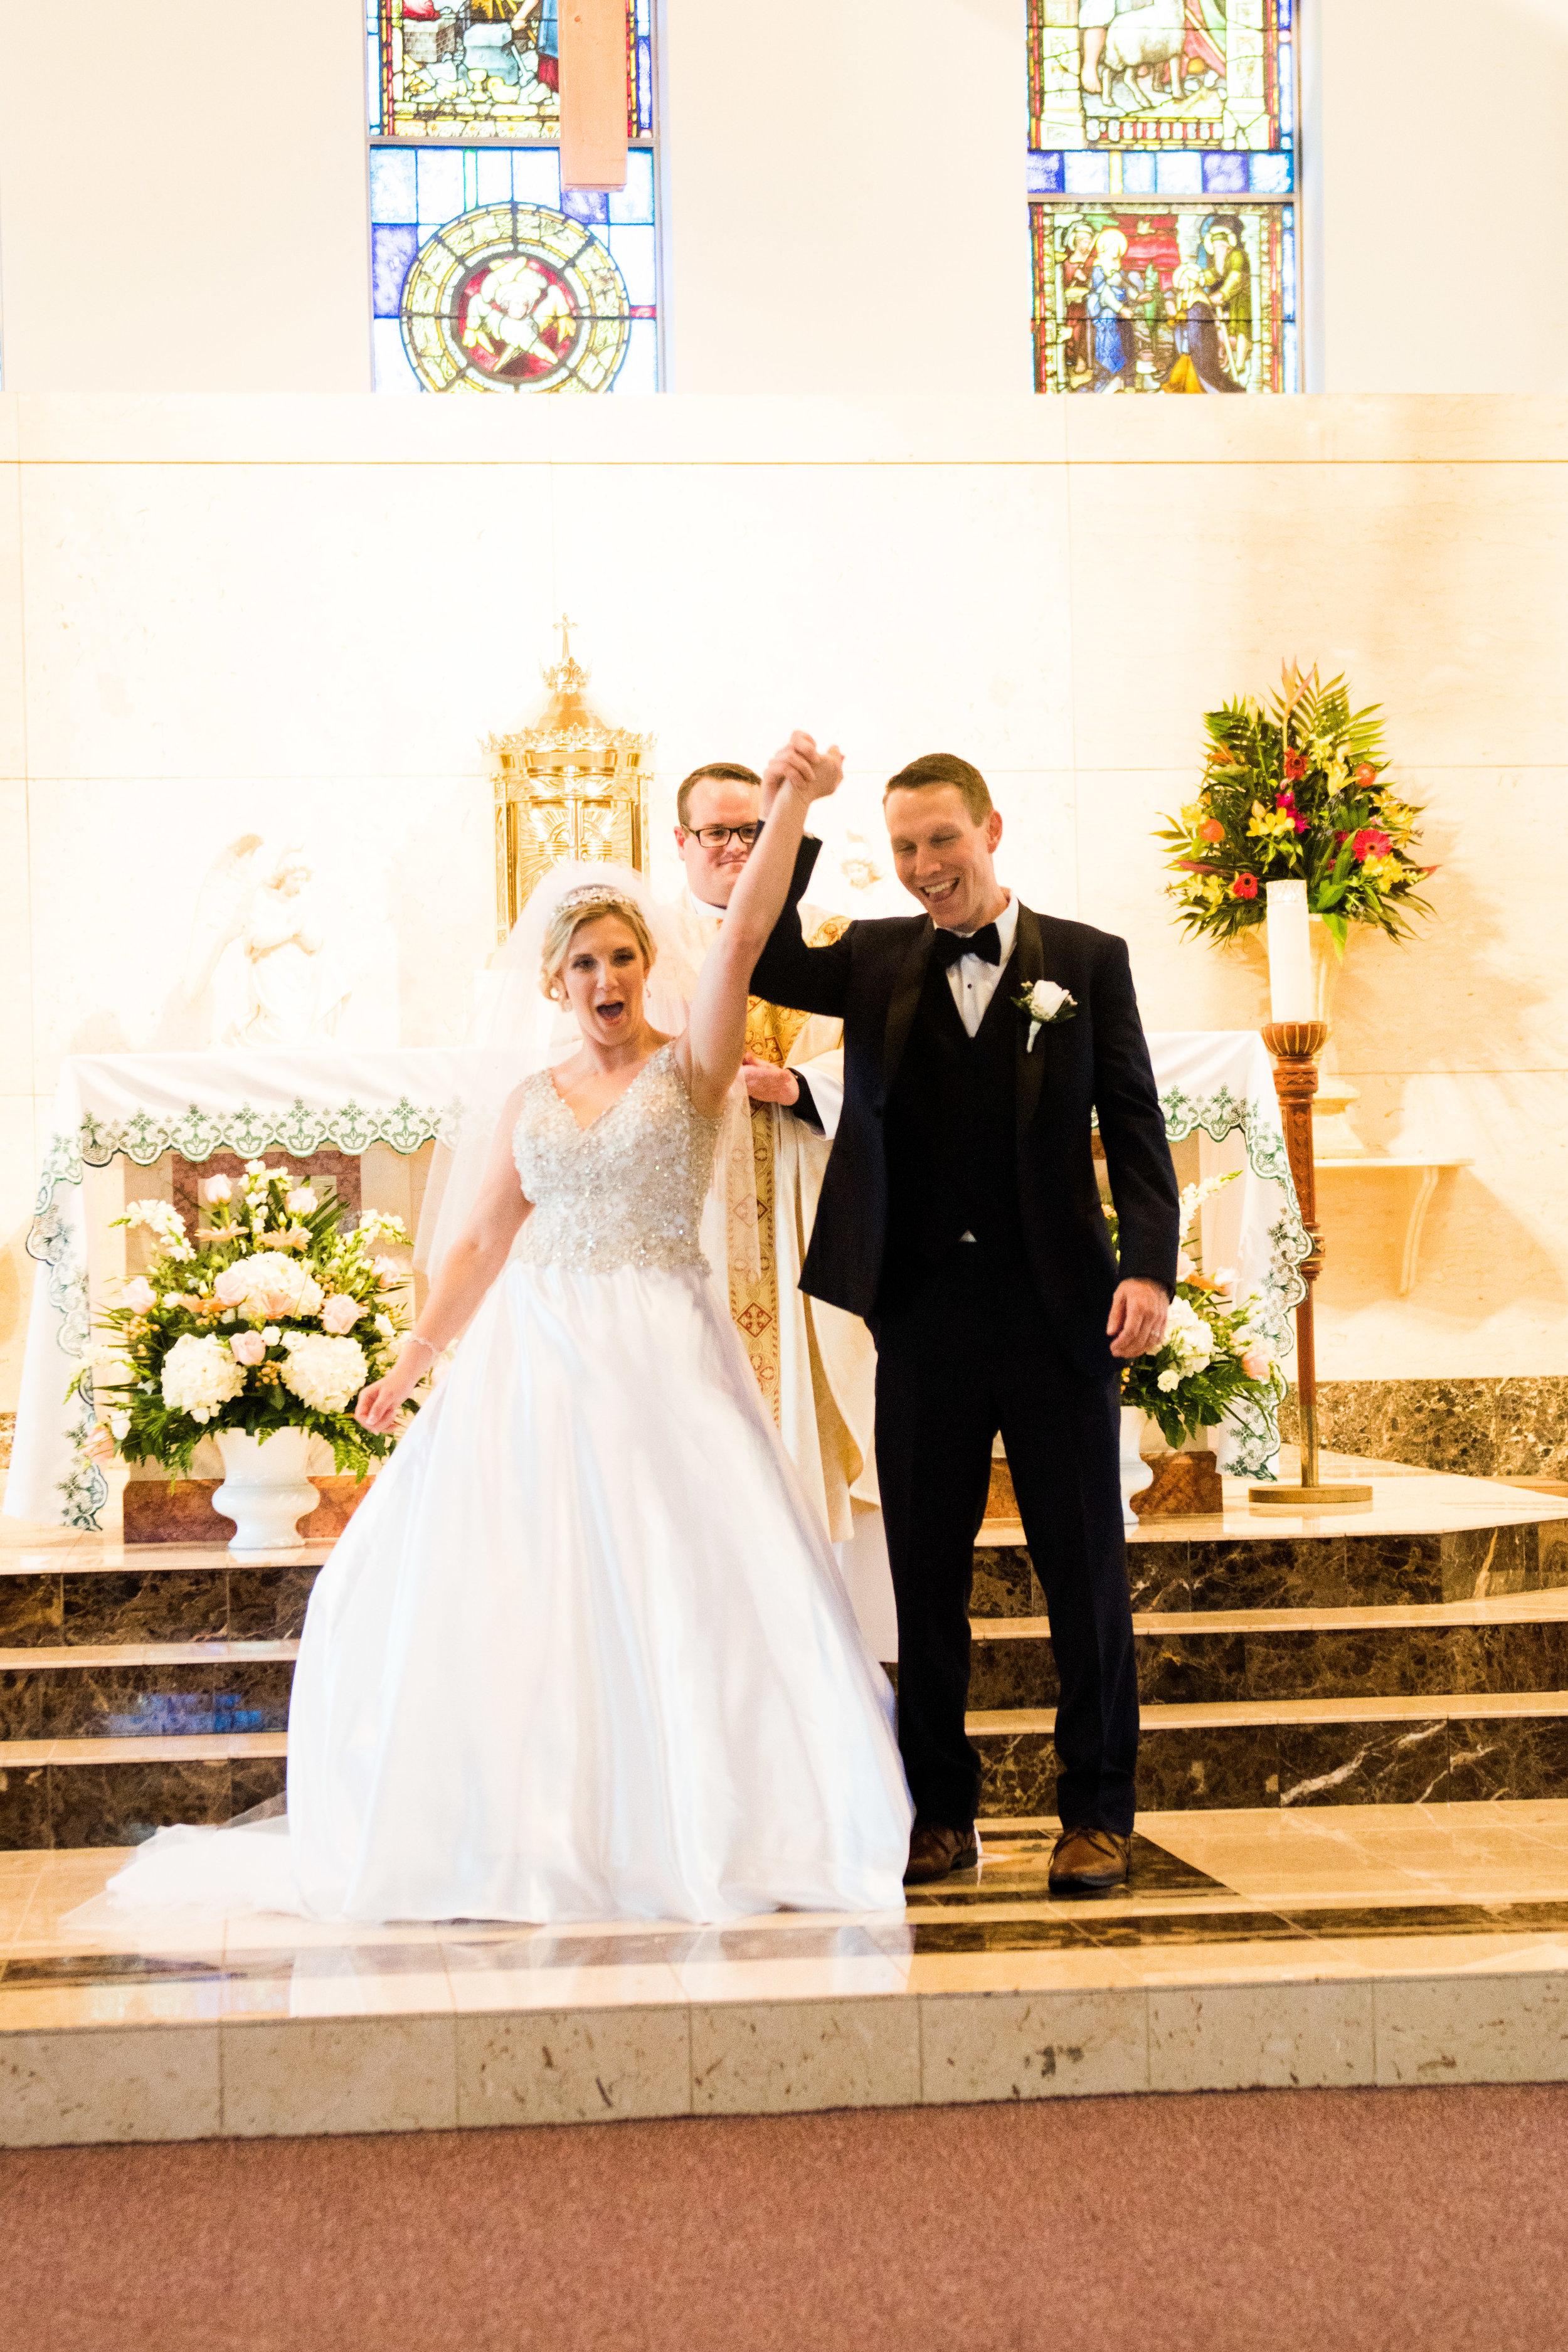 BENSALEM COUNTRY CLUB WEDDING PHOTOGRAPHY - 057EMILY SPONG.jpg